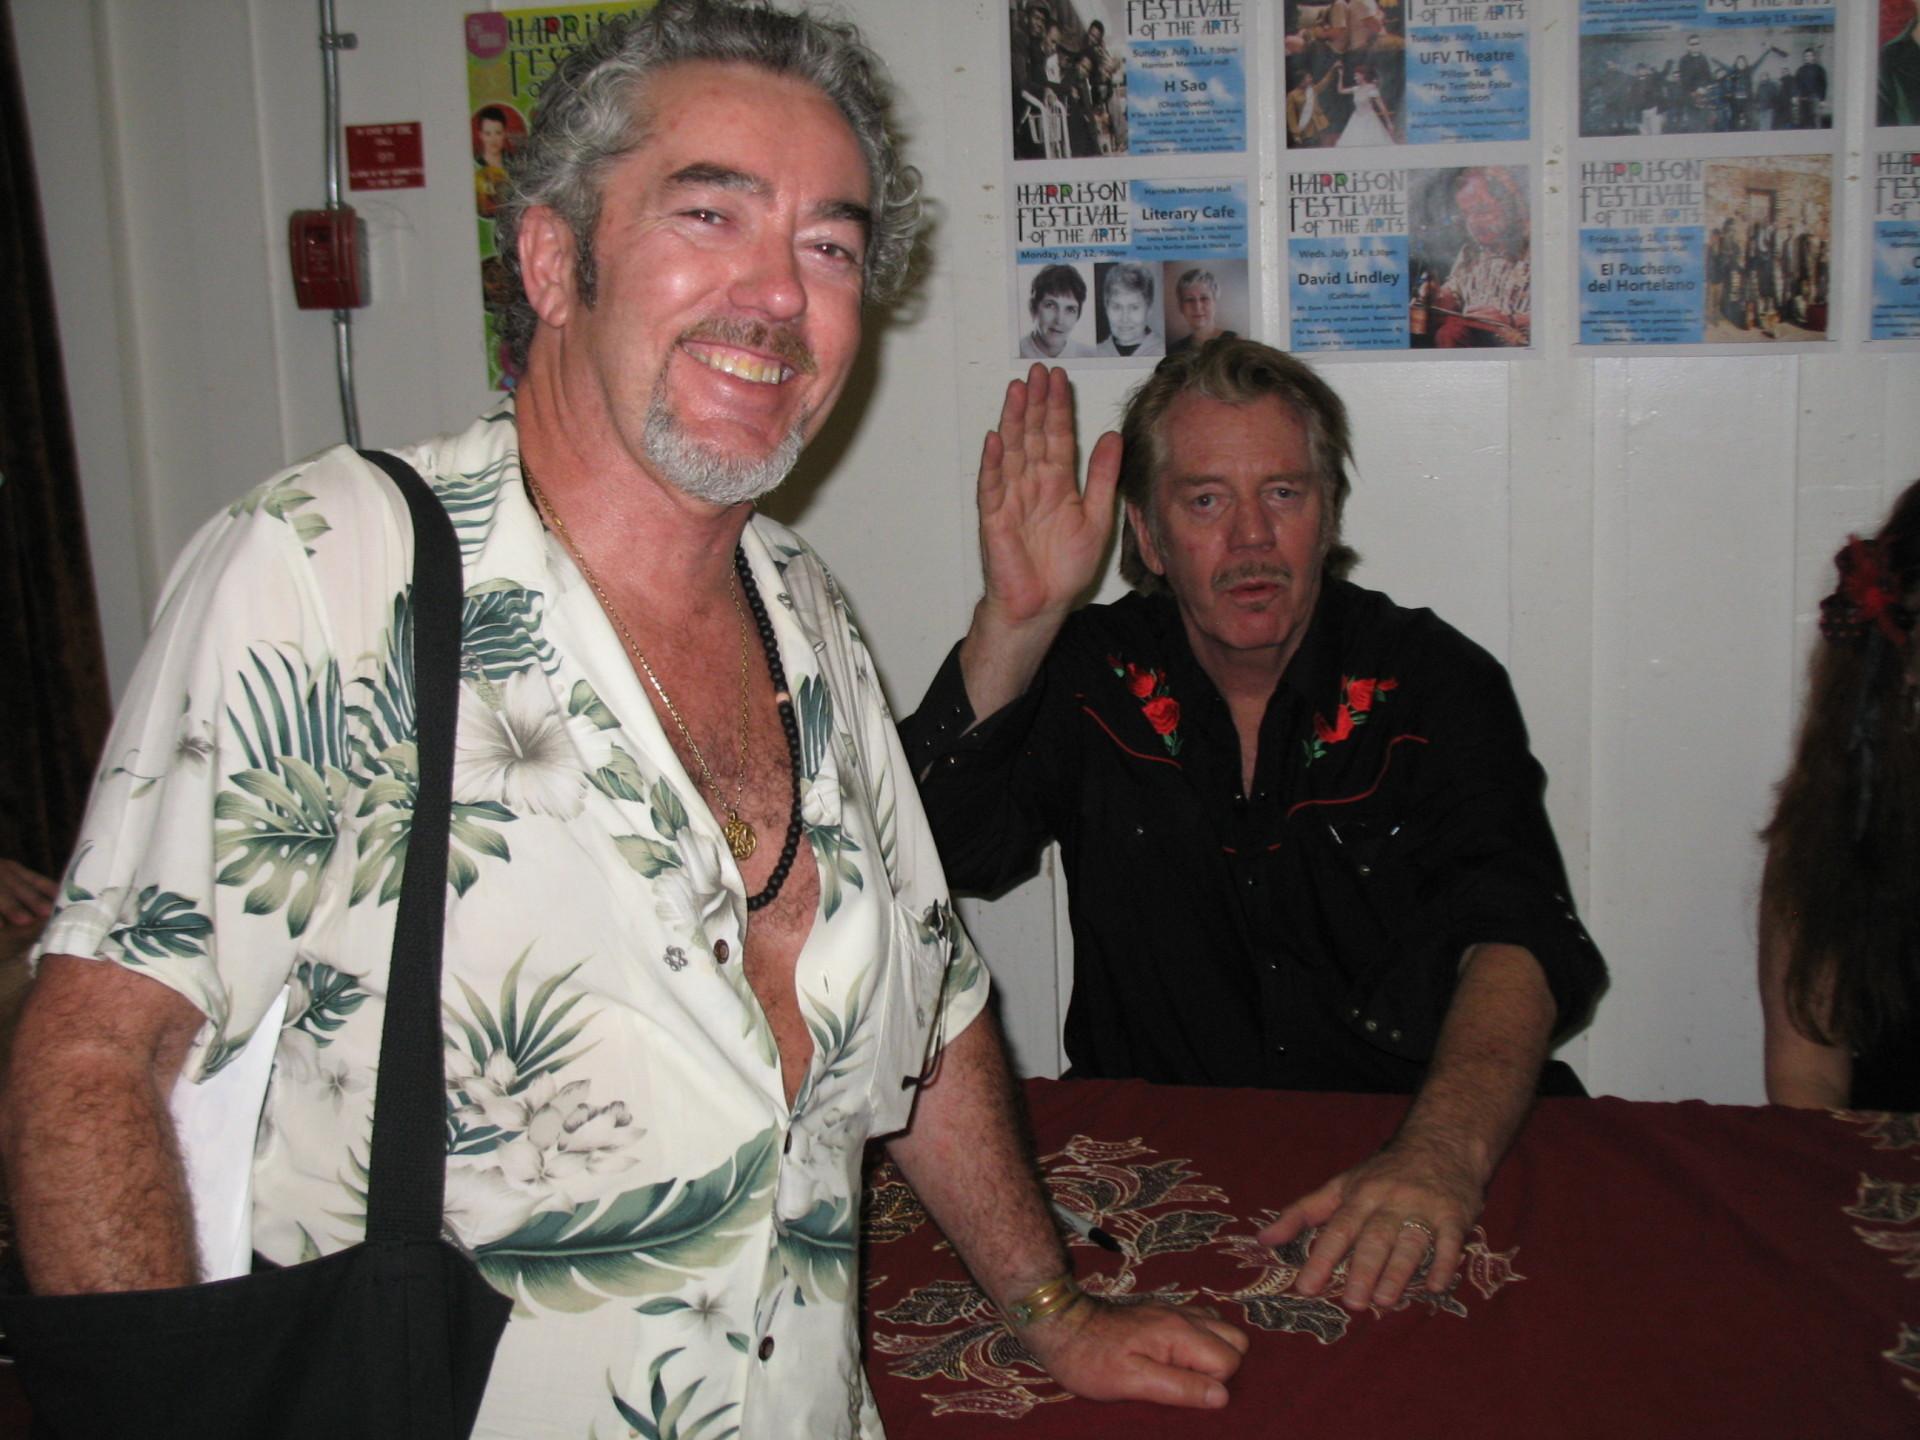 With Dan Hicks, Harrison Festival.